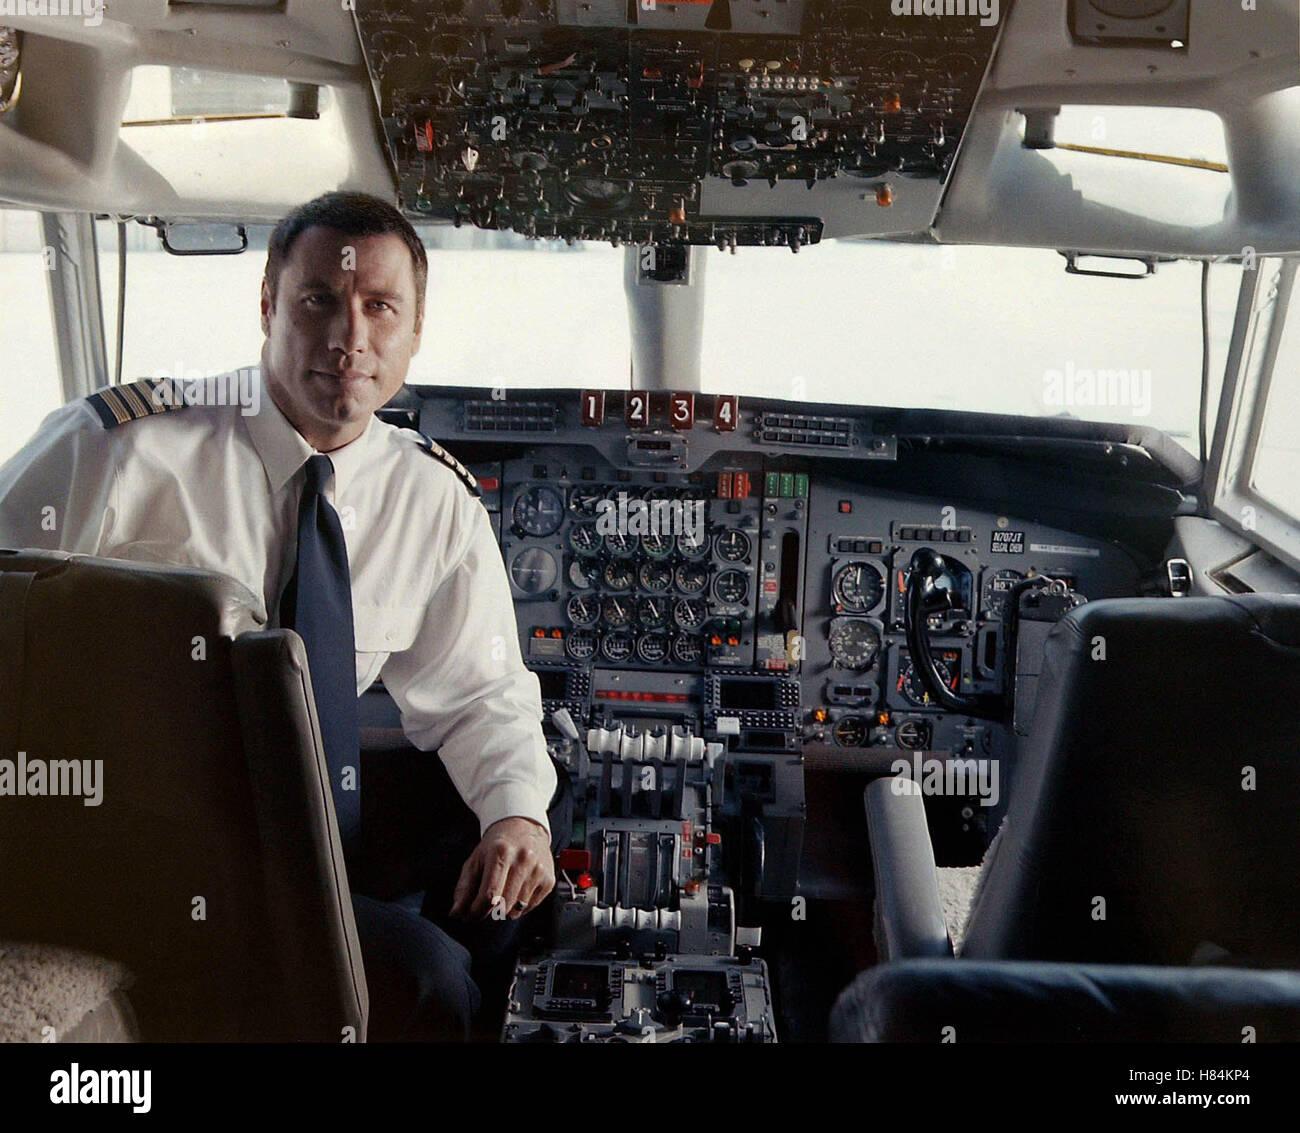 JOHN TRAVOLTA PUBLICITY SHOT QANTAS AMMASSADOR AT LARGE LOS ANGELES AIRPORT [LAX] LOS ANGELES USA 24 June 2002 - Stock Image